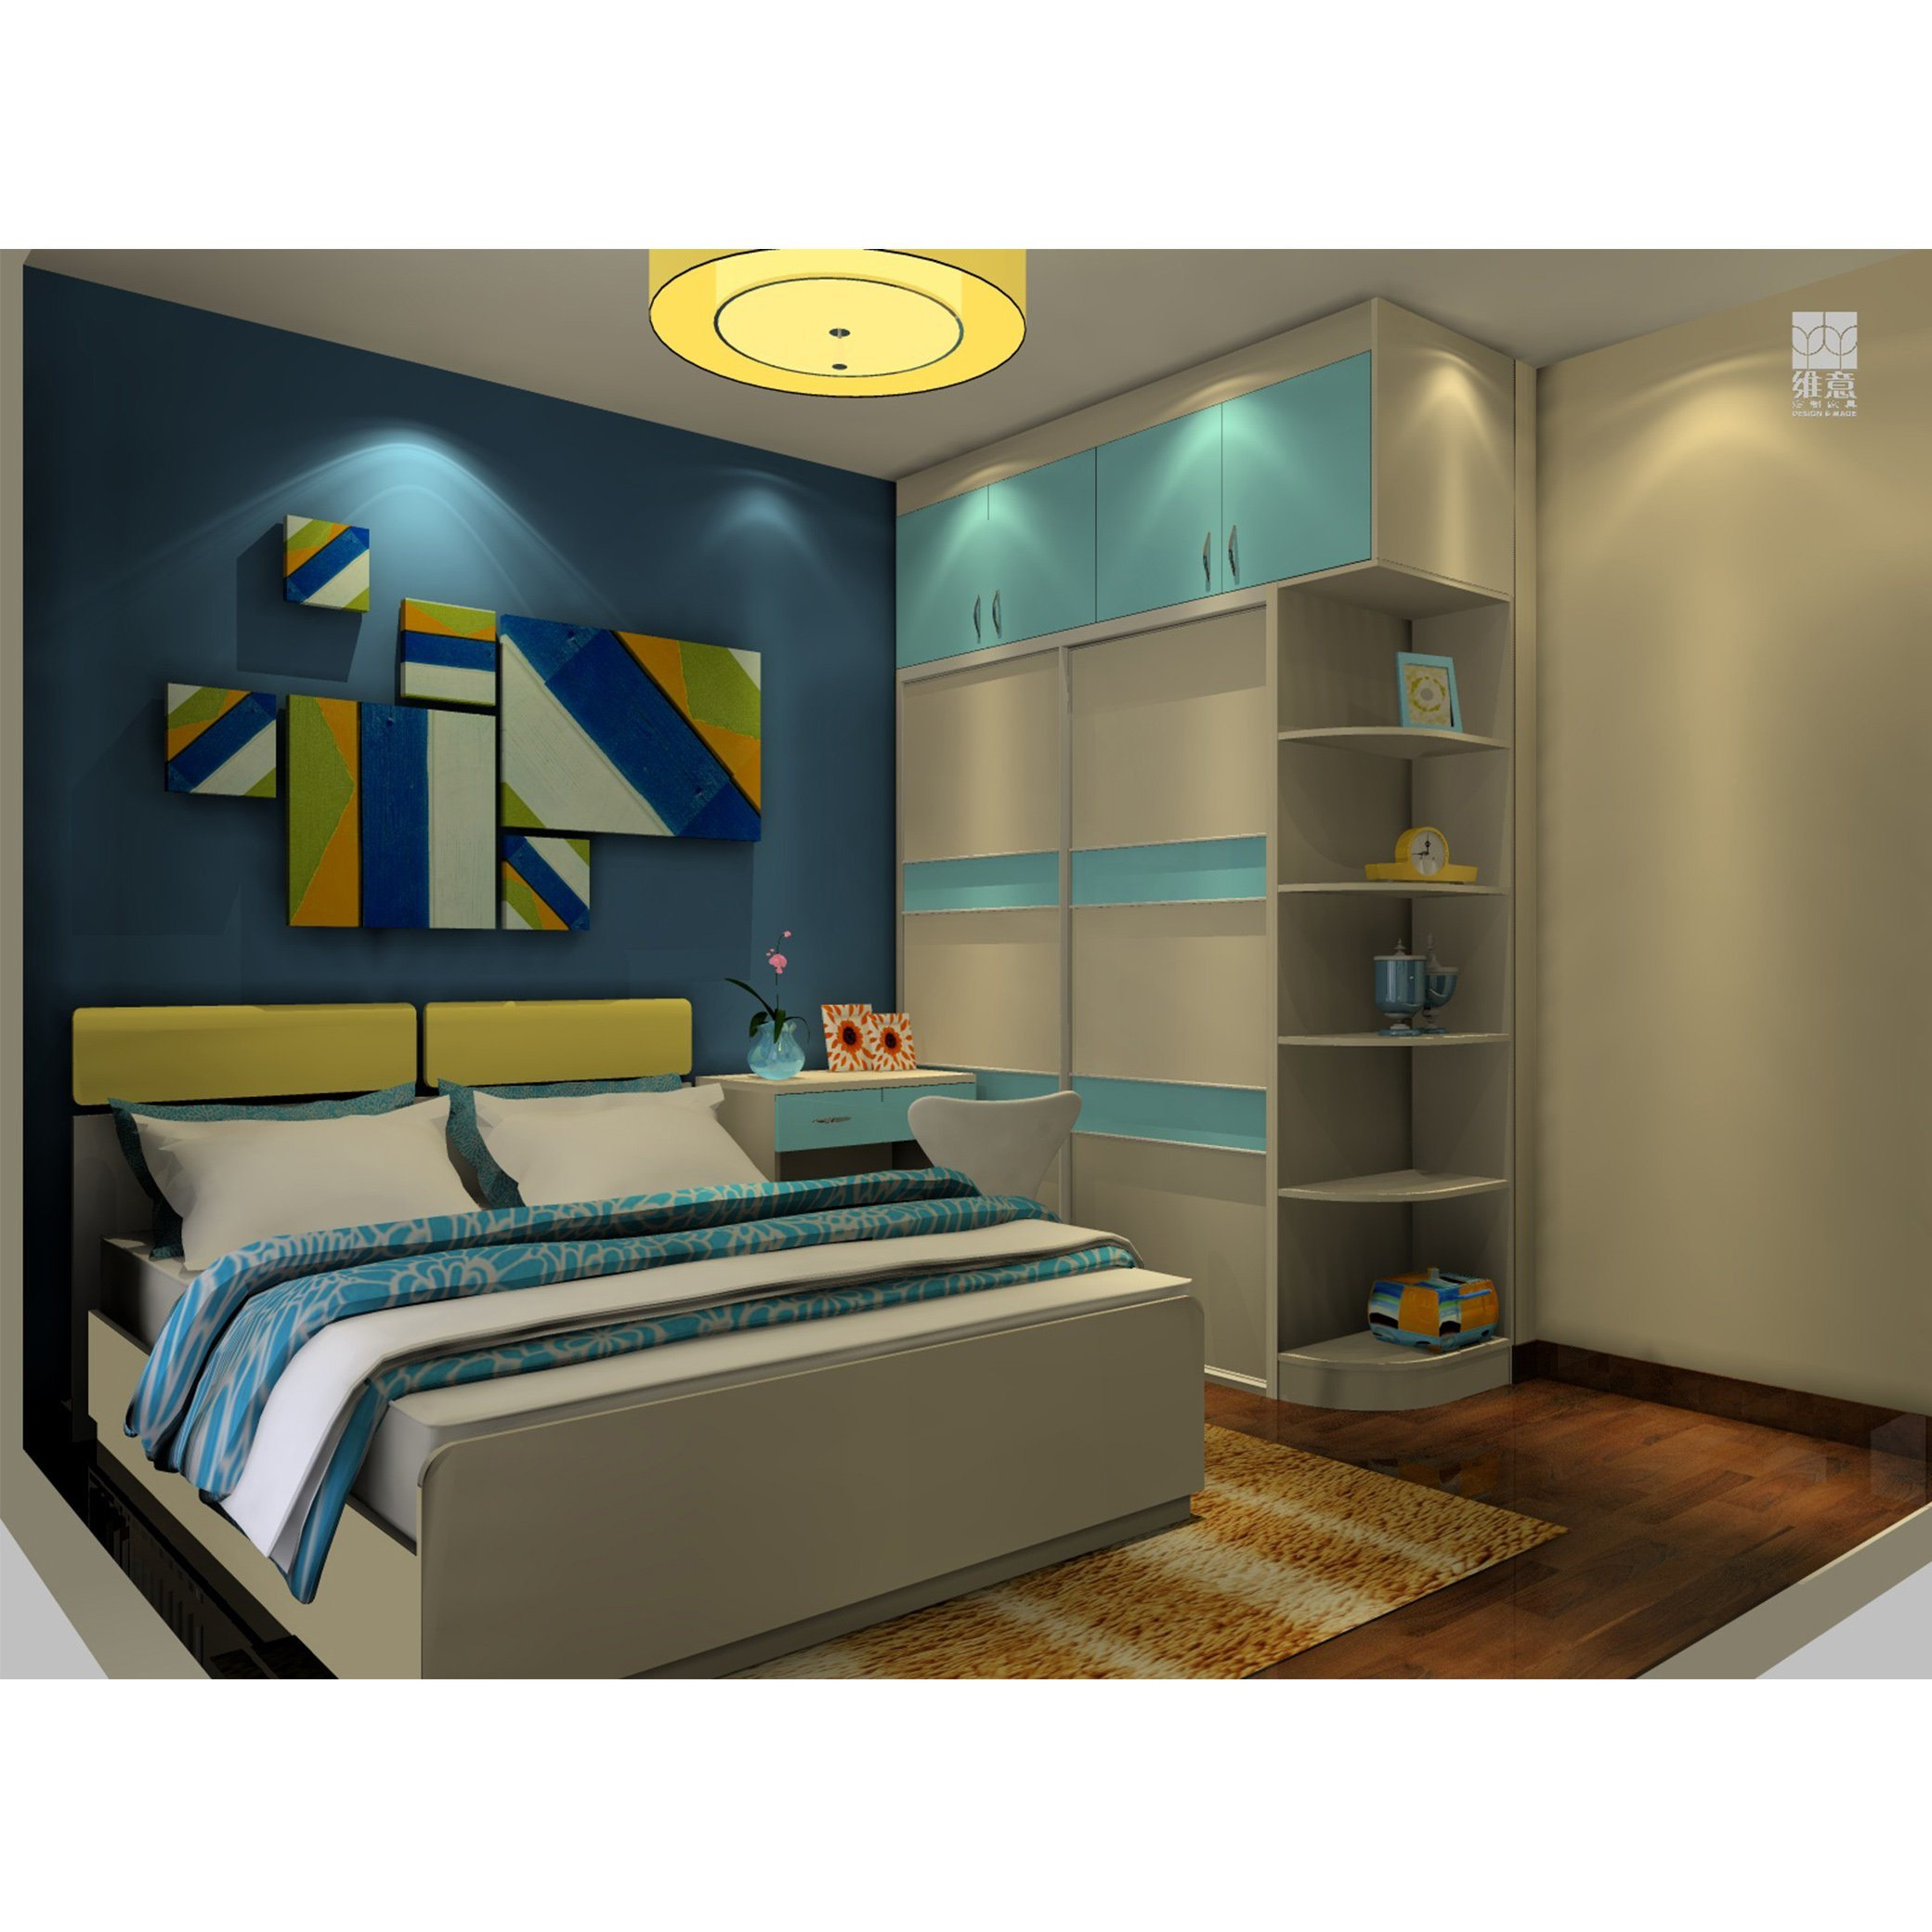 Home Design White and Blue Lacquer Color Contrast Sliding Wardrobe